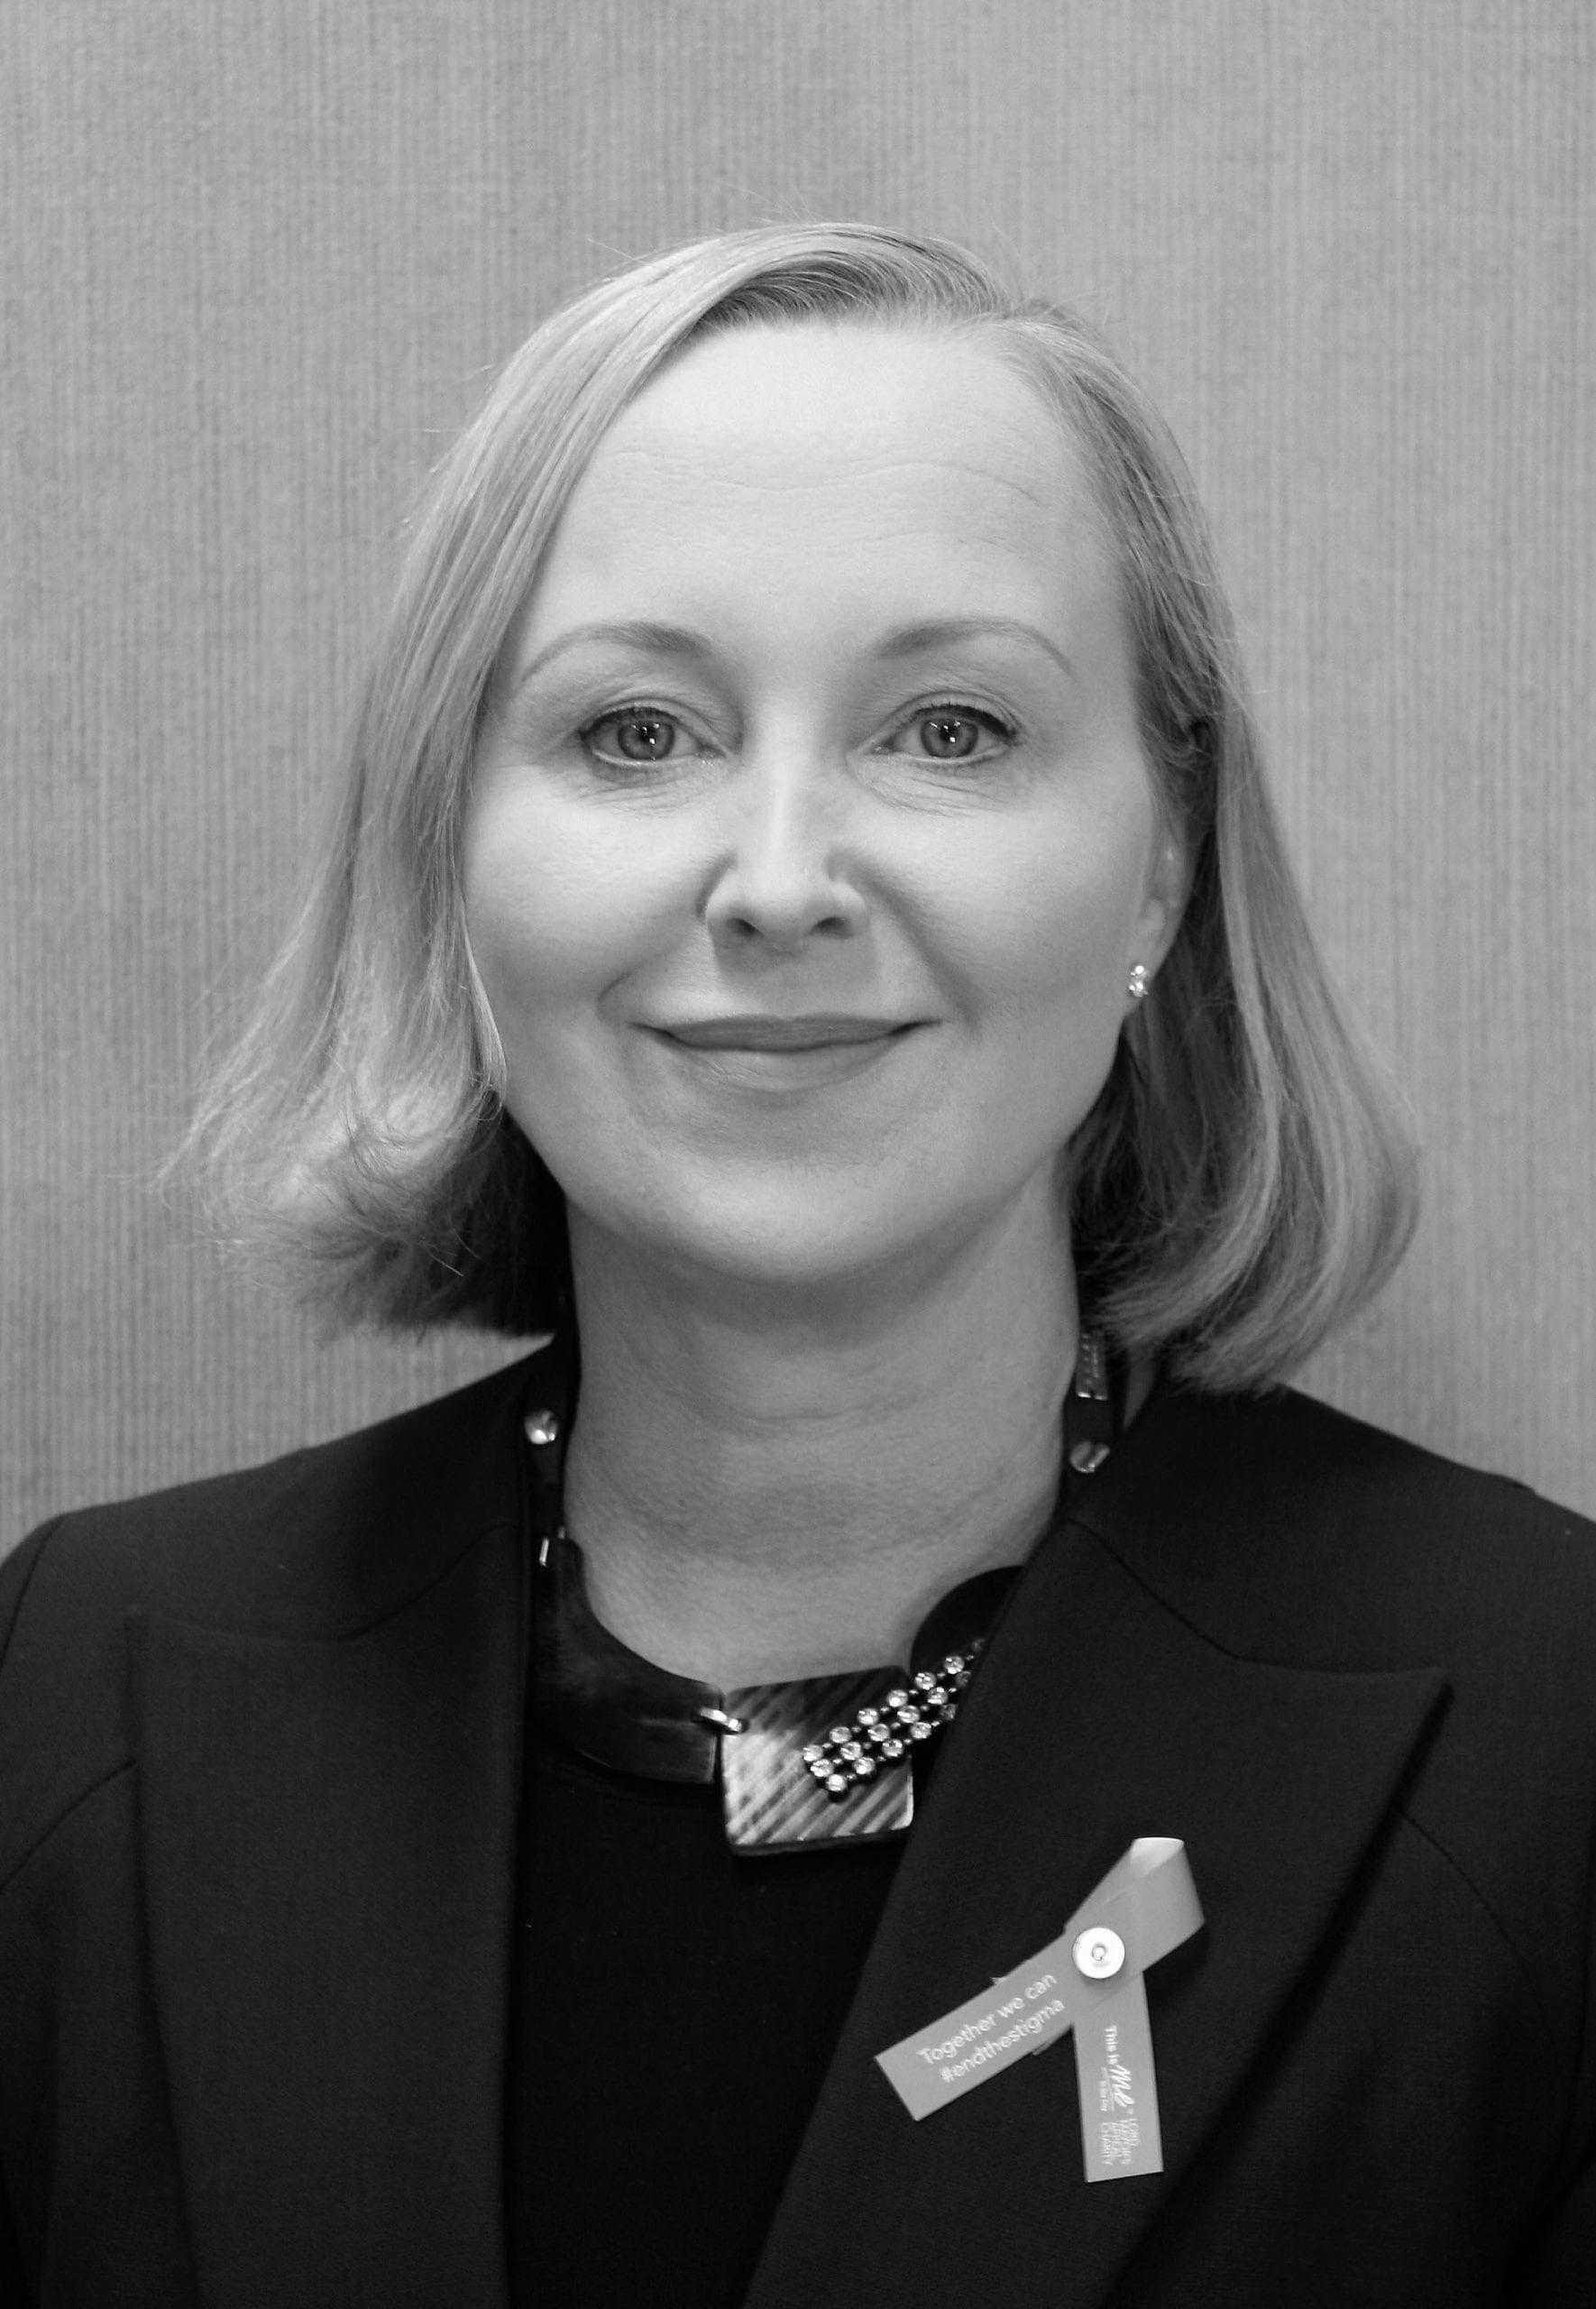 Eva Lindholm smiles in a black and white photo